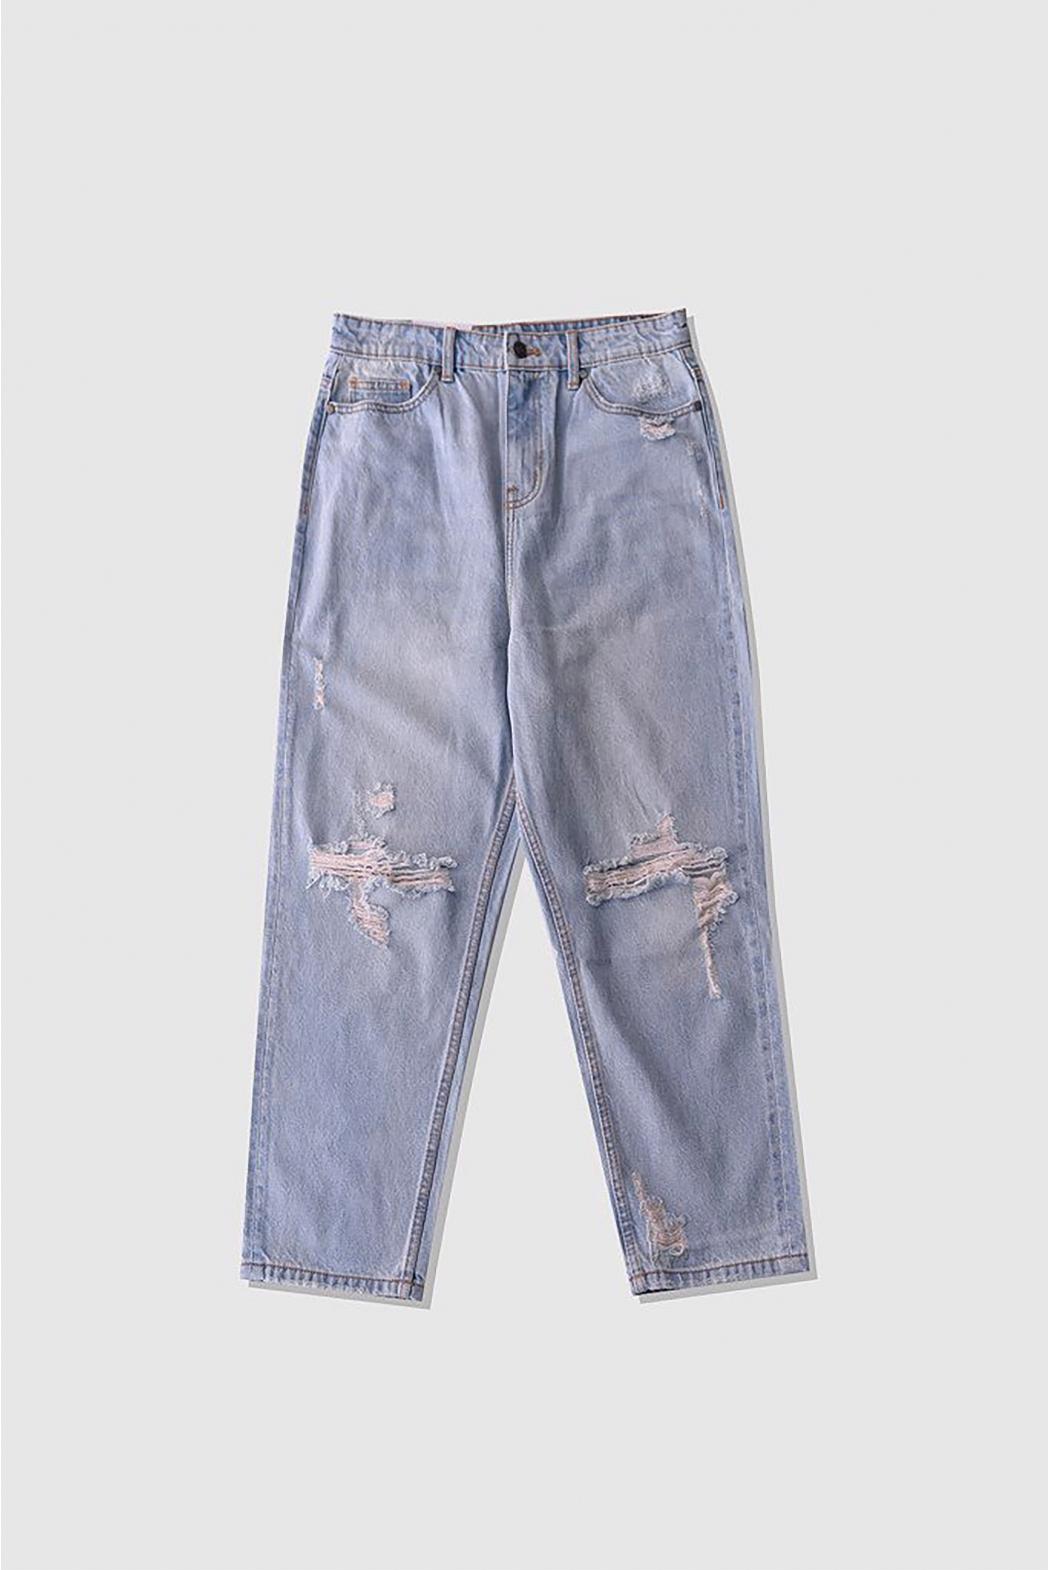 Indigo. Loose crop jeans rách DNP05-S20 - QJ229001